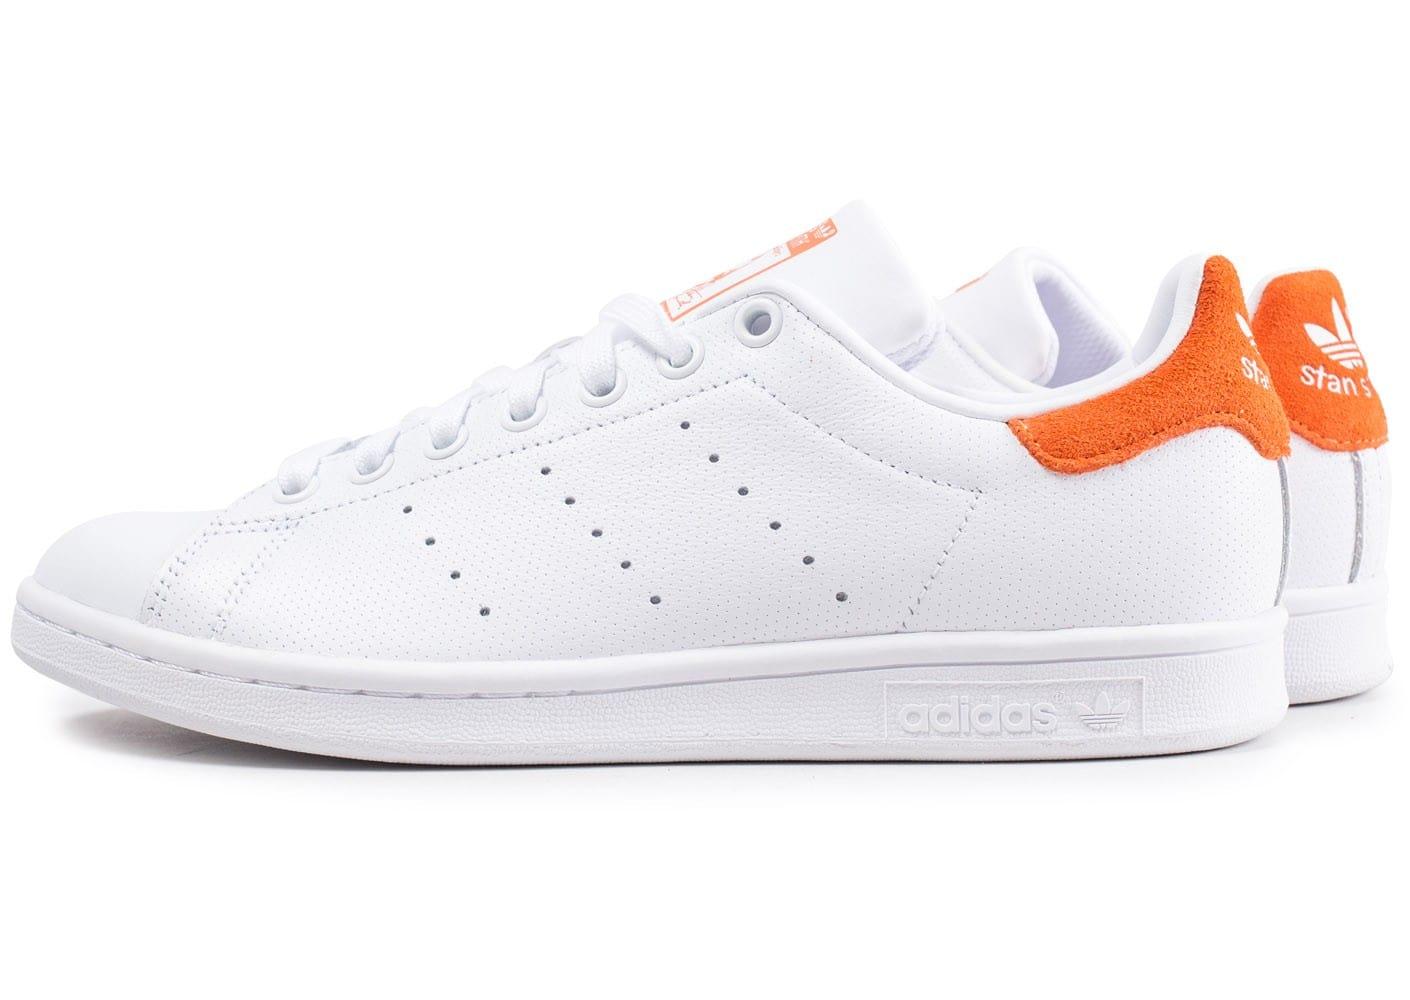 5c90129361c adidas stan smith femme orange Avis en ligne